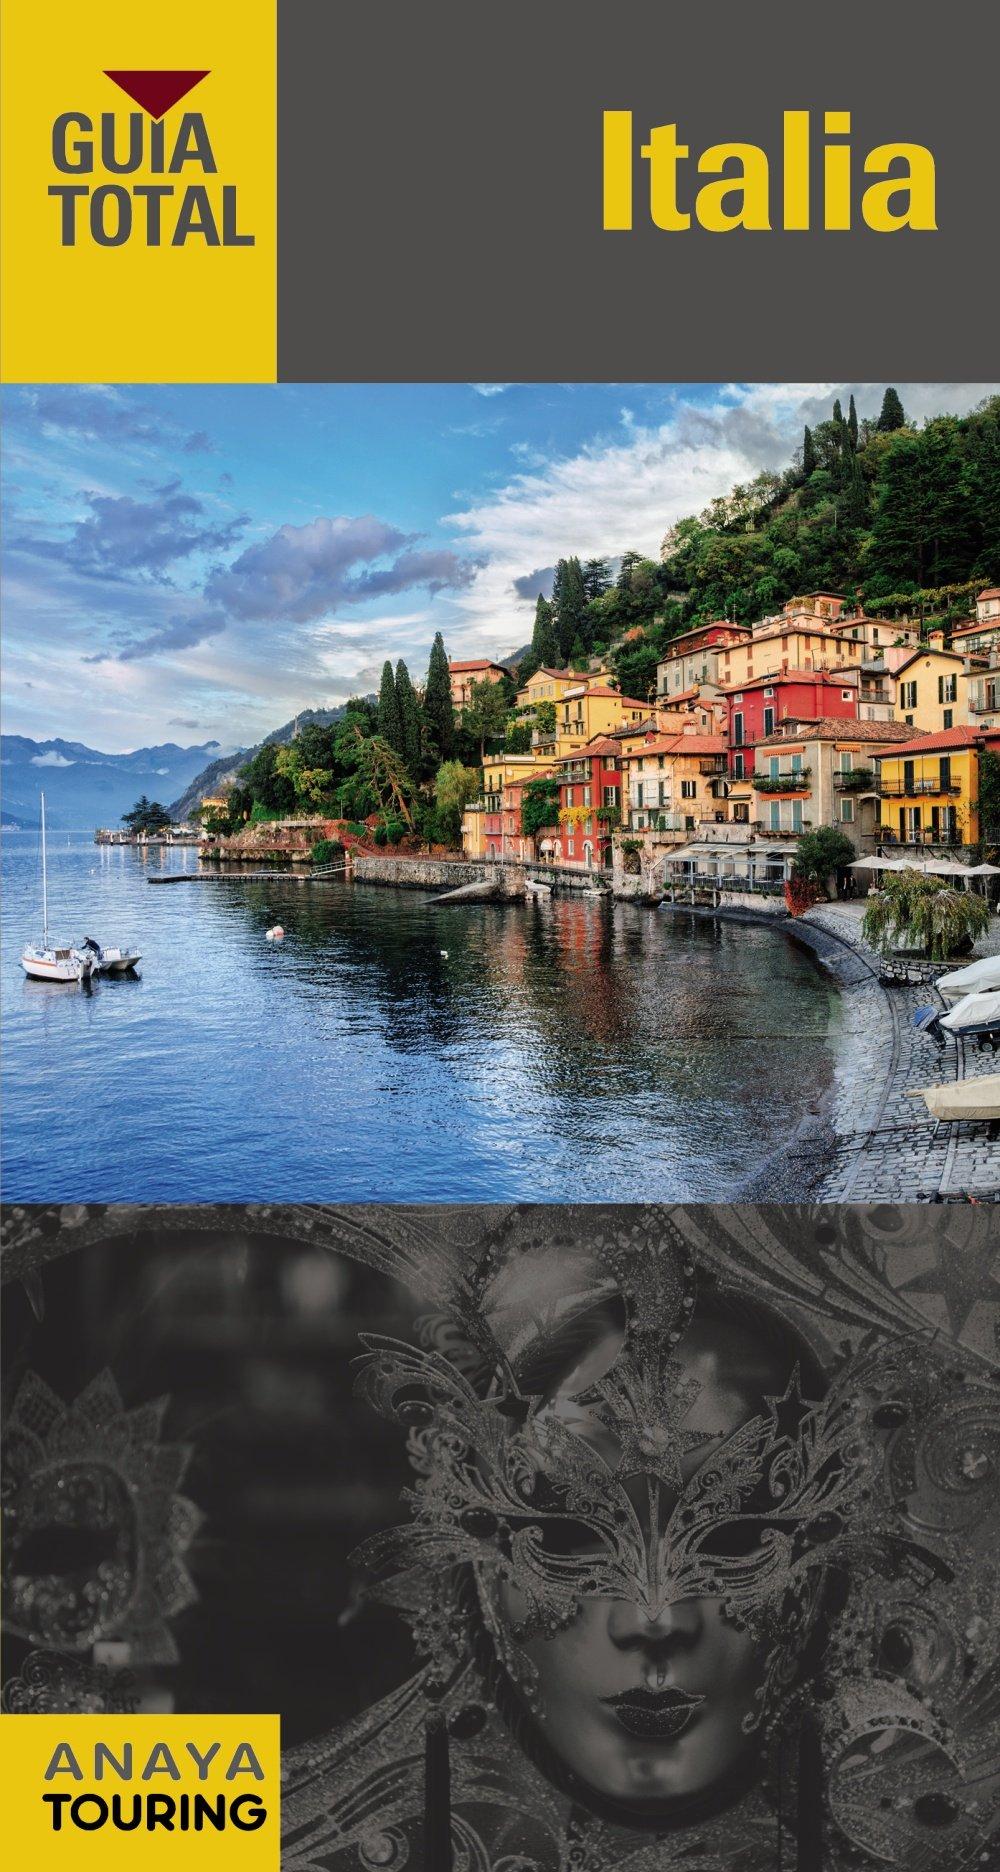 Italia (Guía Total - Internacional): Amazon.es: Anaya Touring, Touring Editore: Libros